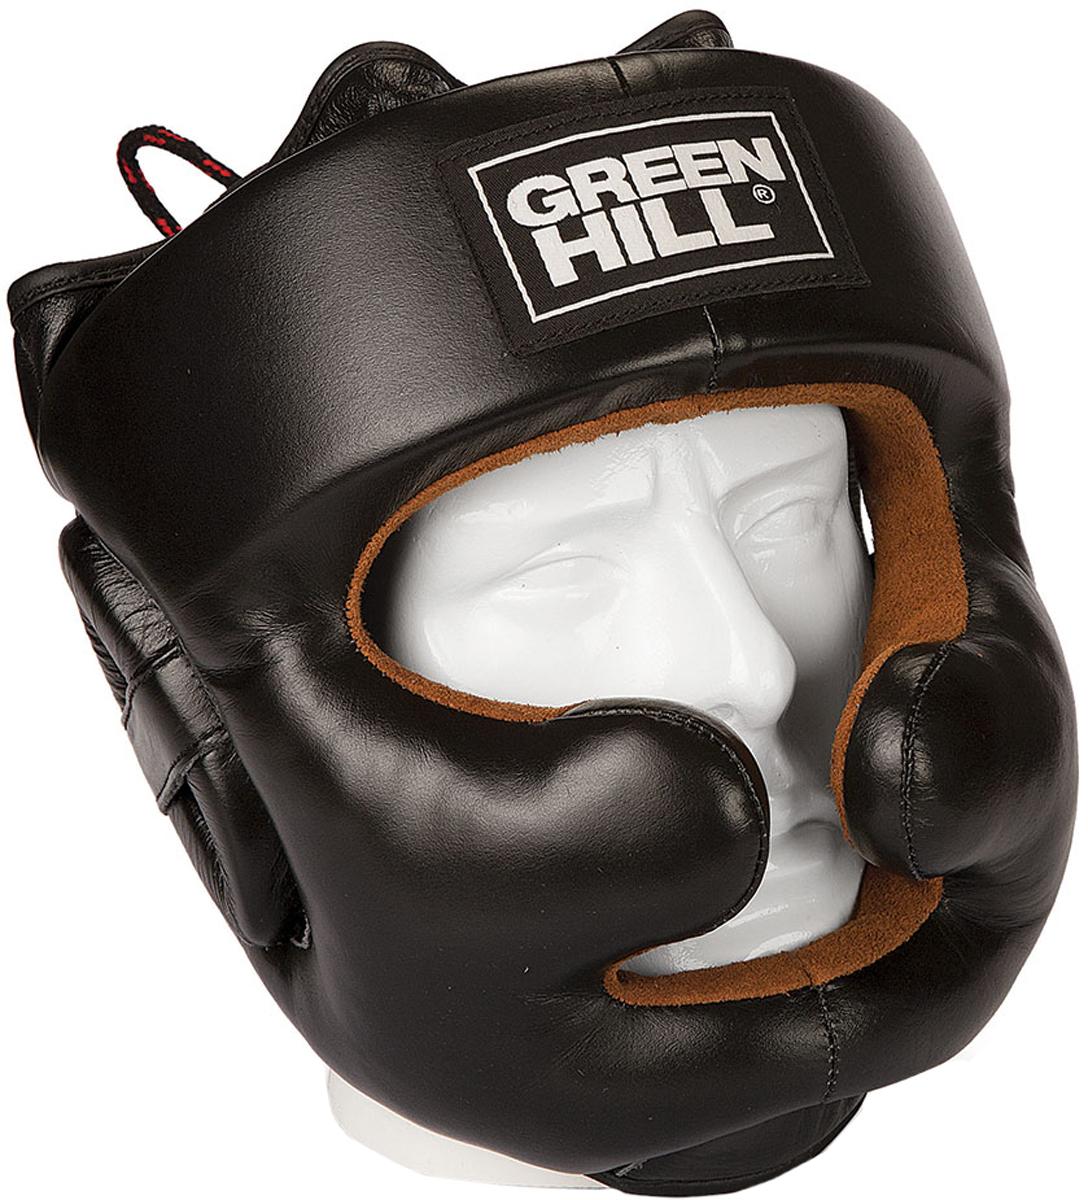 Шлем боксерский Green Hill  Lux , цвет: черный. Размер L - Бокс